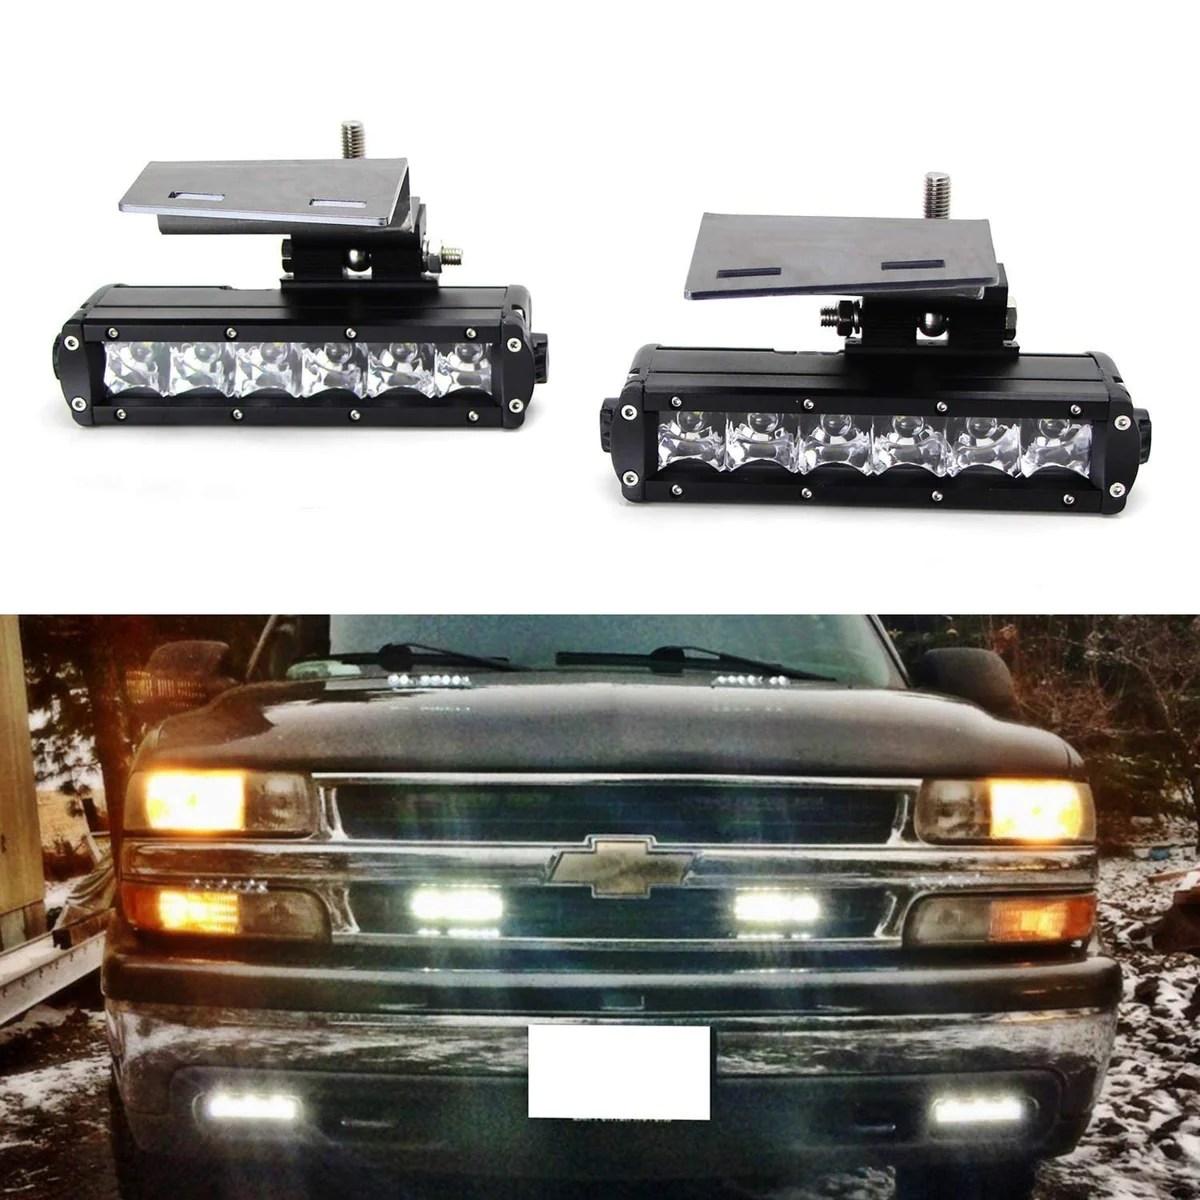 small resolution of led light bar fog lamps kit for 99 02 chevrolet silverado 1500 2500 00 01 3500 00 2006 suburban tahoe includes 2 30w cree led light bars